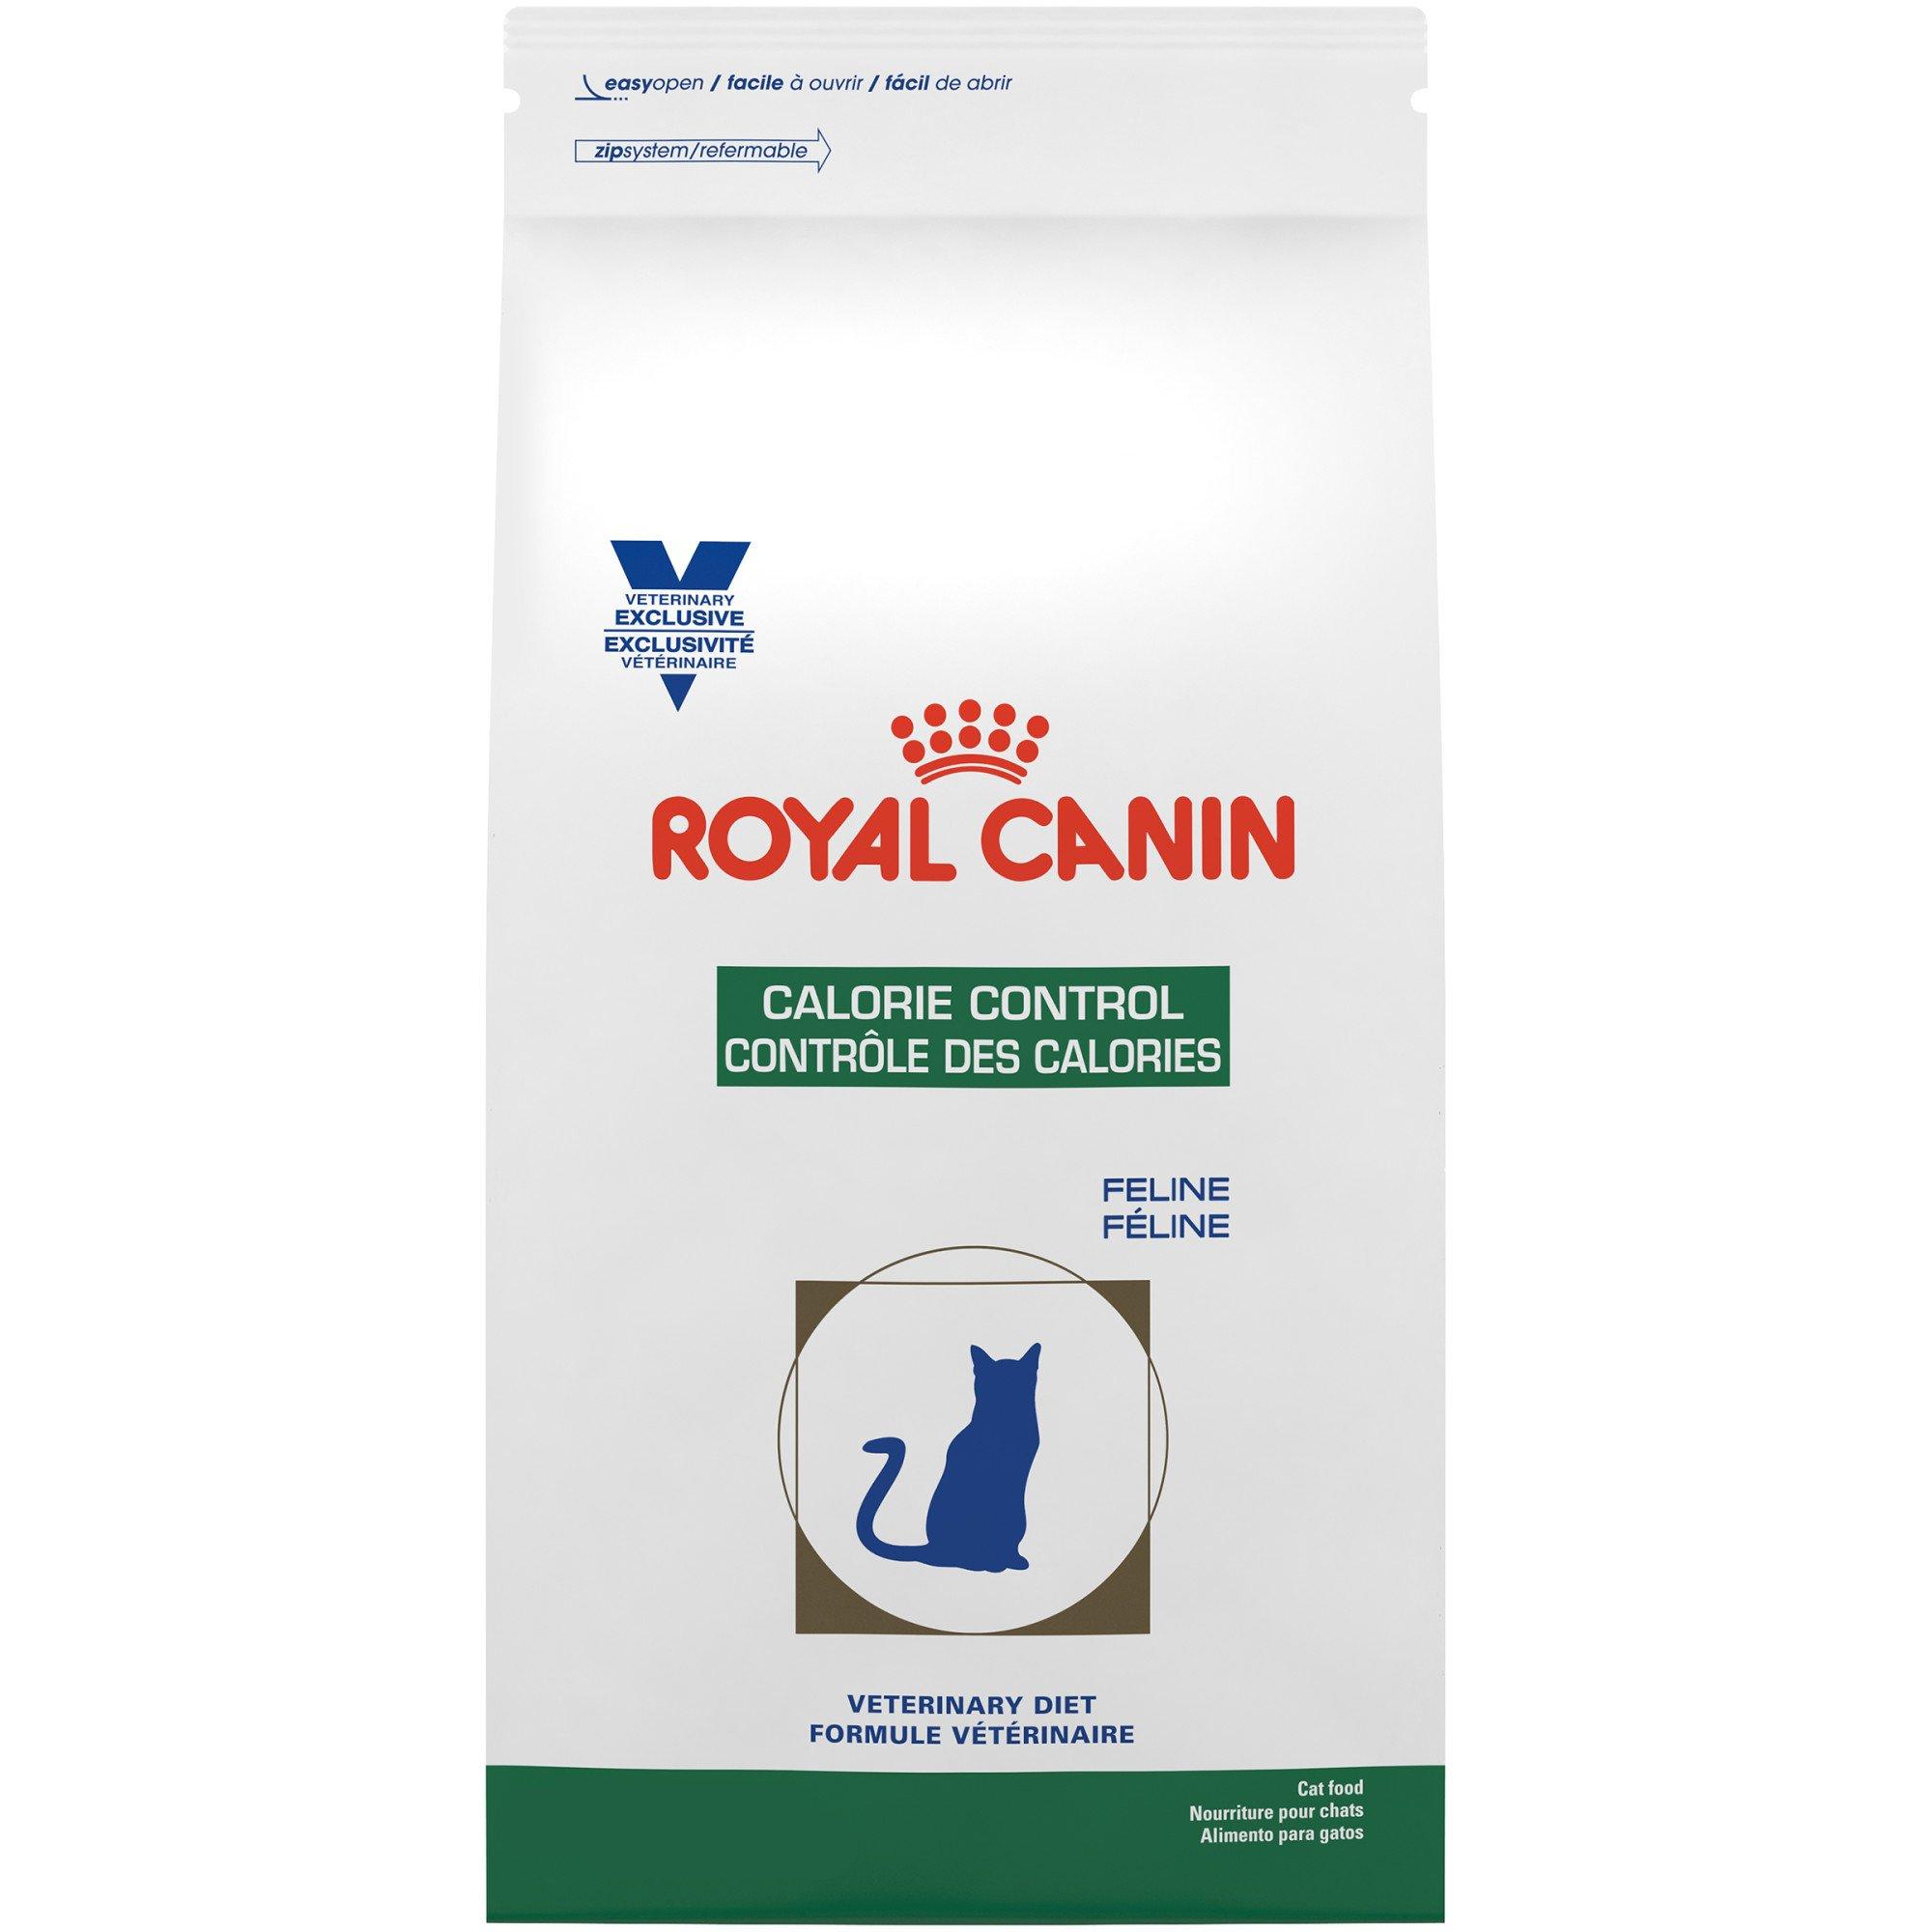 Royal Canin Calorie Control Cat Food